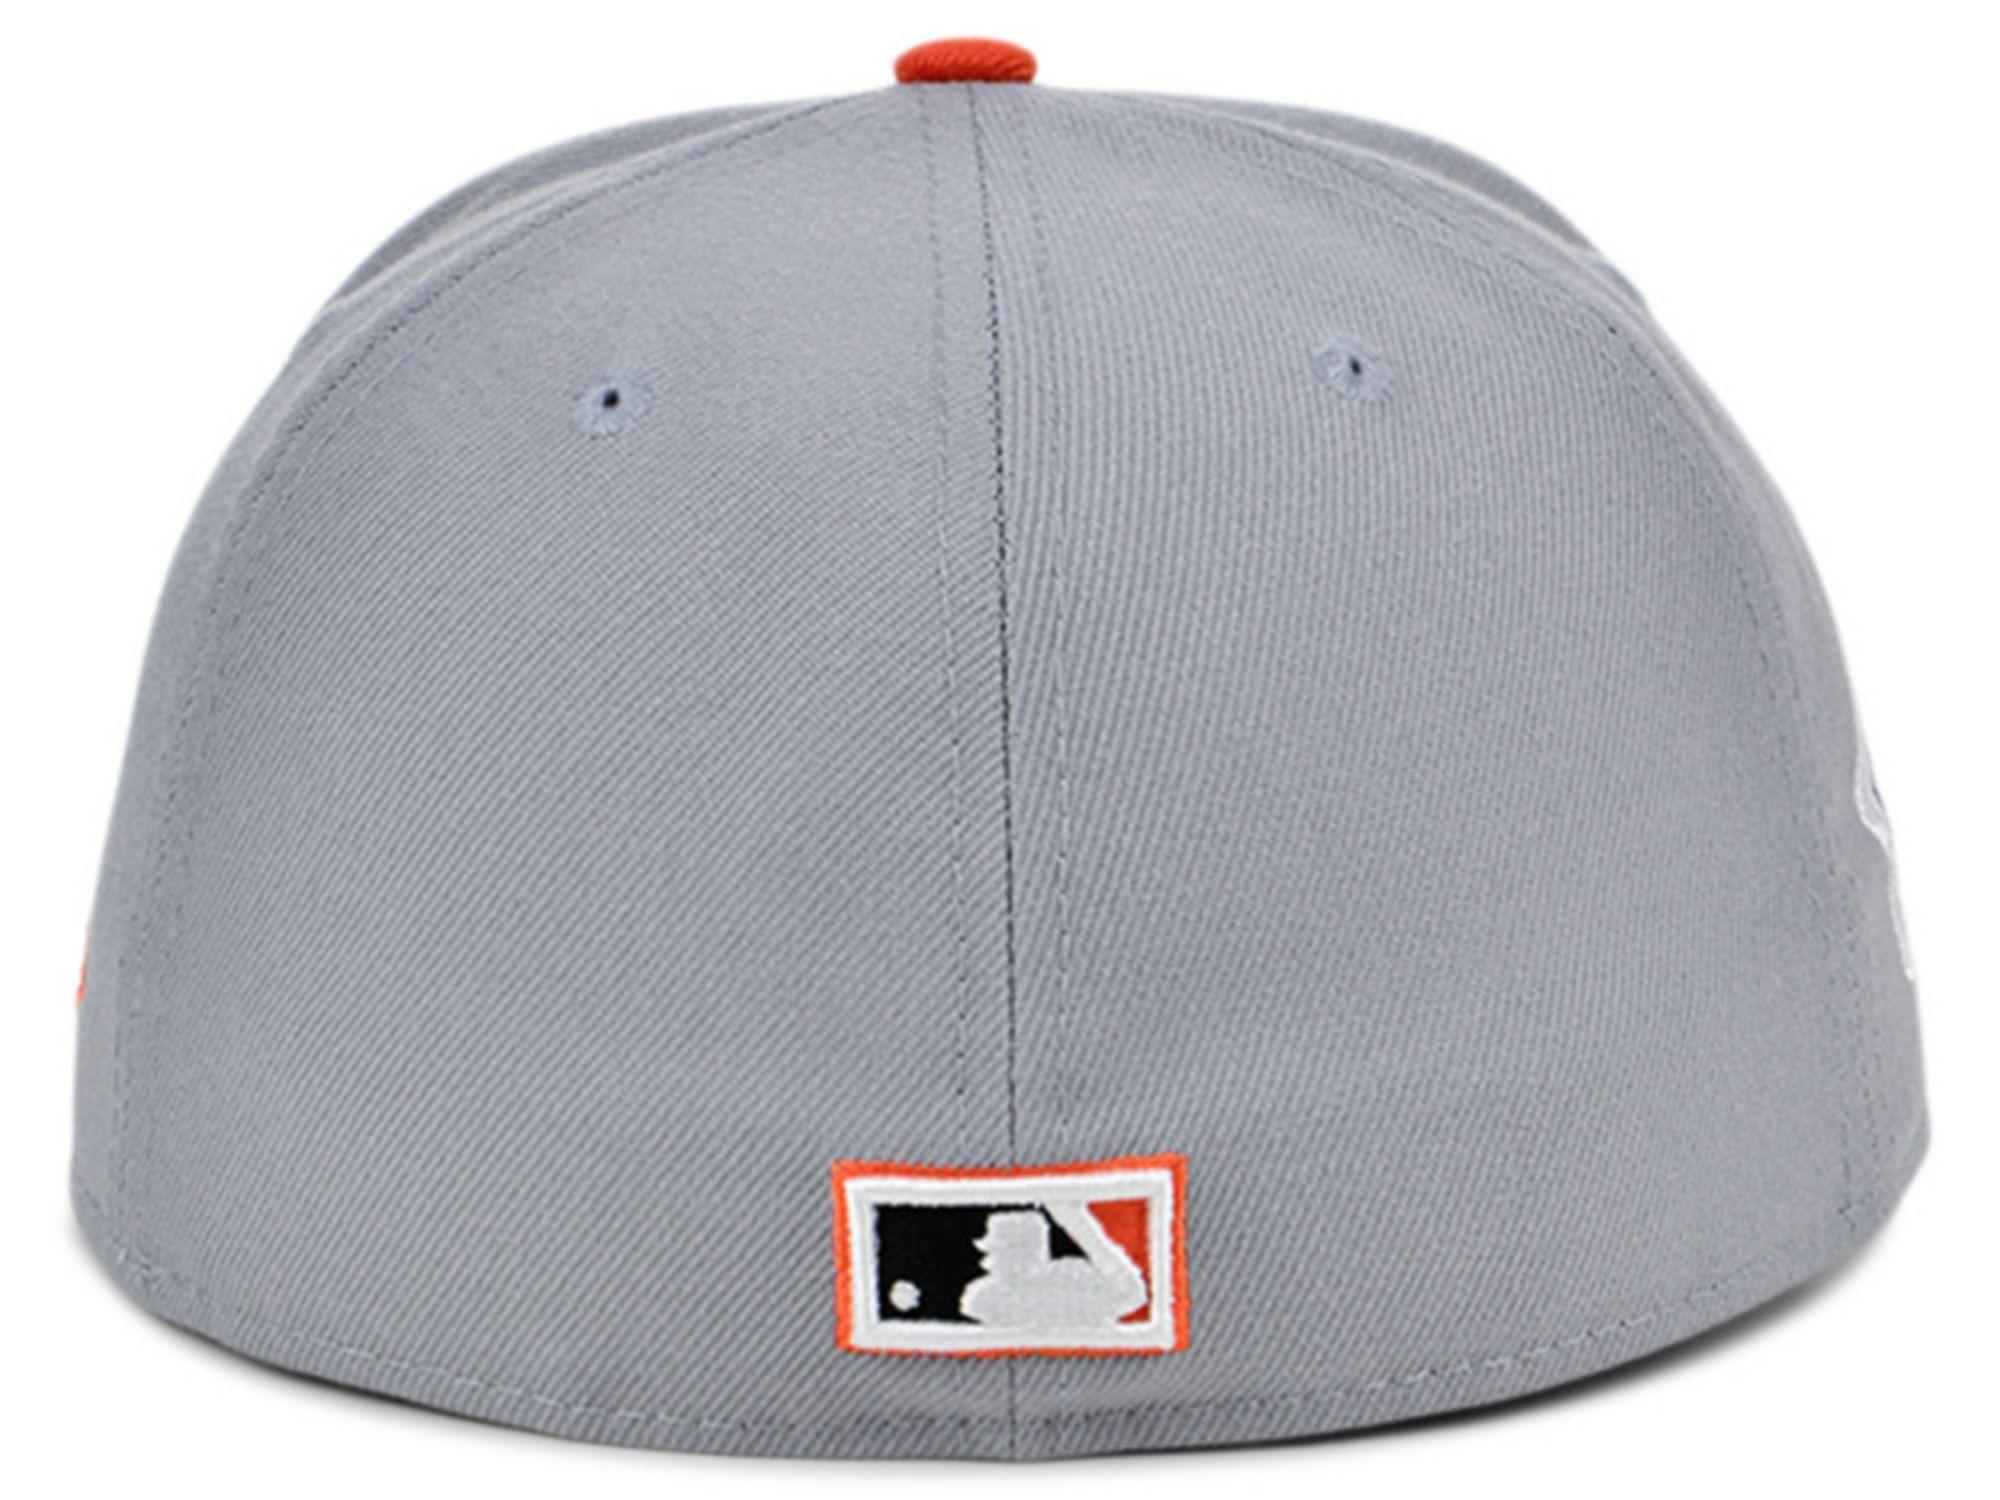 New Era San Francisco Giants Gray Anniversary 59FIFTY Cap & Reviews - MLB - Sports Fan Shop - Macy's